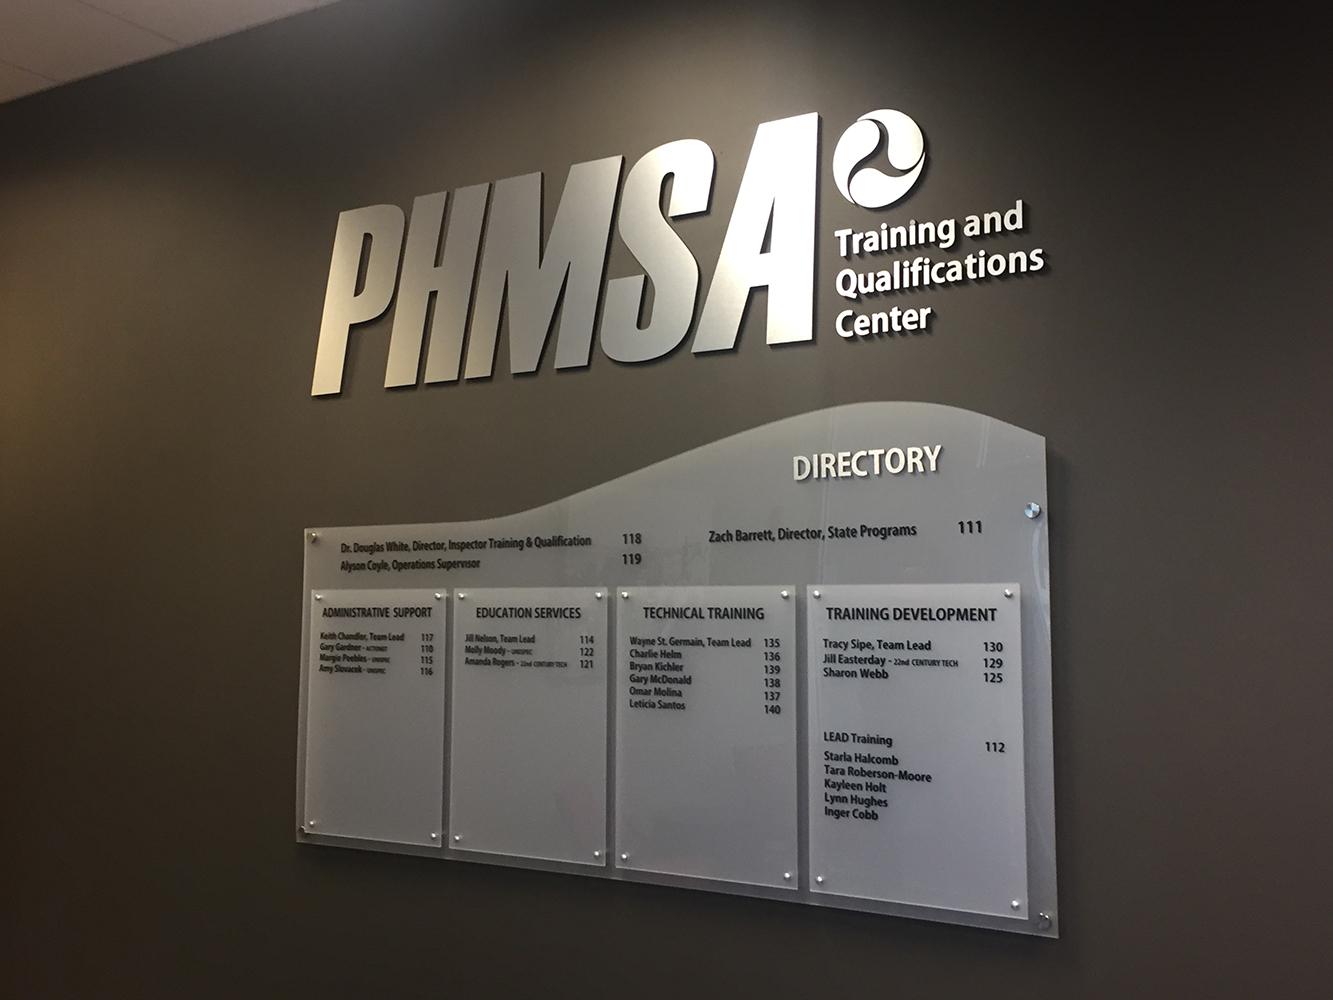 interior - PHMSA directory